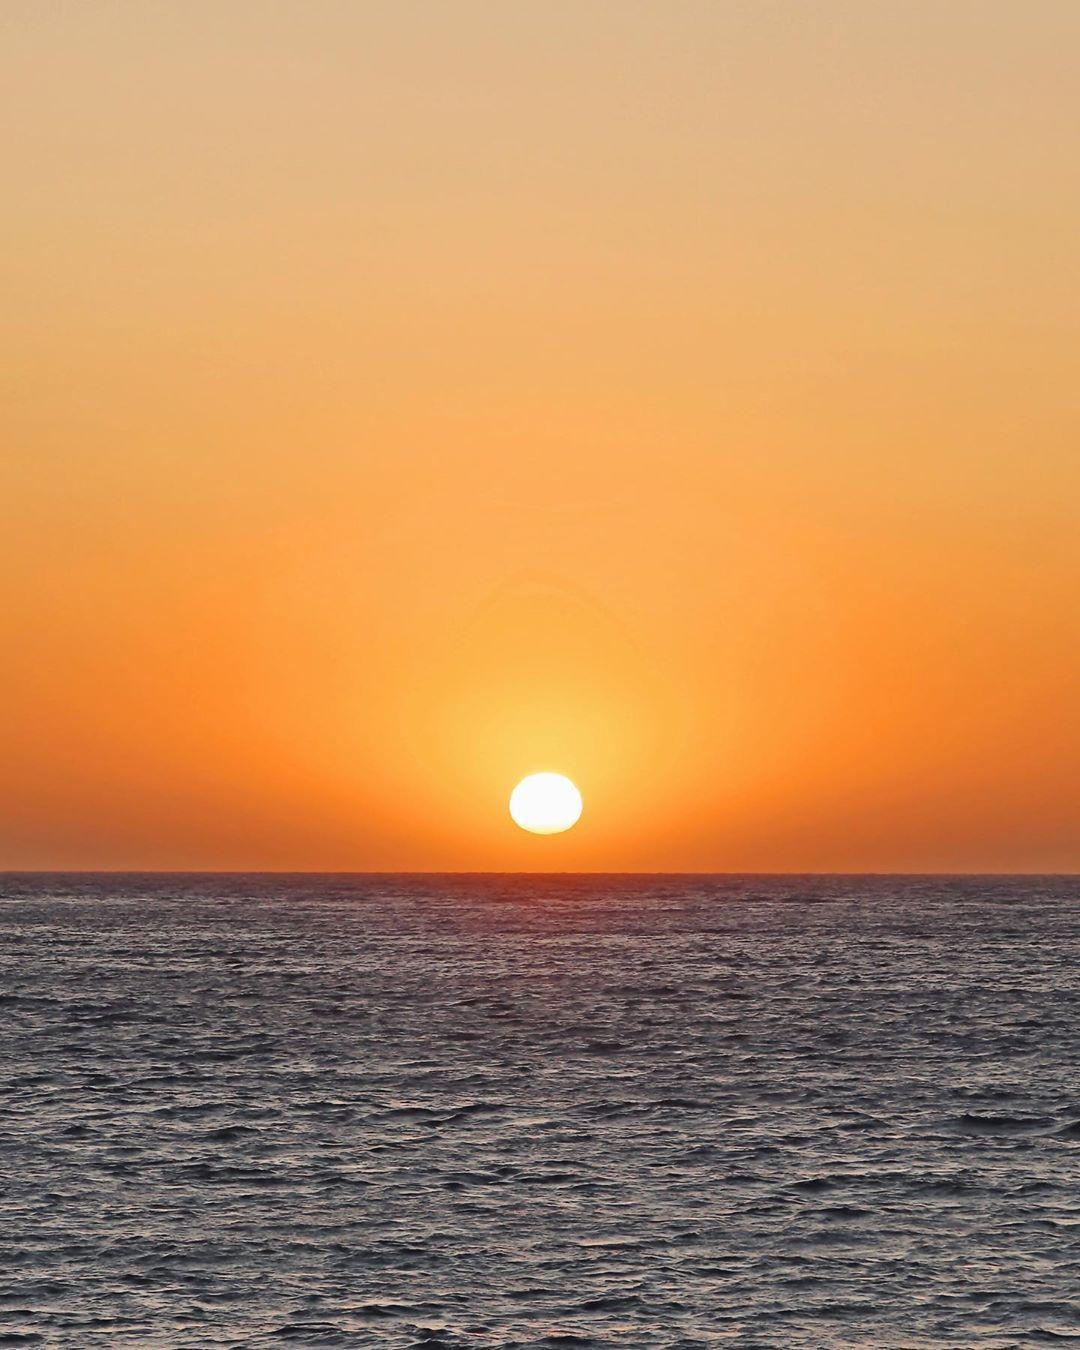 We've said it before and we'll say it again, Perth is WAY better than okay! 💖 . . . . 📷 @lexisargeant | #westisbest #scarboroughbeach #scarborough #sorrentobeach #sorrento #needabreak #choicehotels #justanotherdayinwa #sunset_stream #sunset_vision  #sunset_madness_ #sunset_pics #sunset_love #sunset_ig #sky_painters #perthlife #westernaustralia #australia #tourismwa #perthisokay #visitwa #thisiswa #takemetoaustralia  #seeaustralia